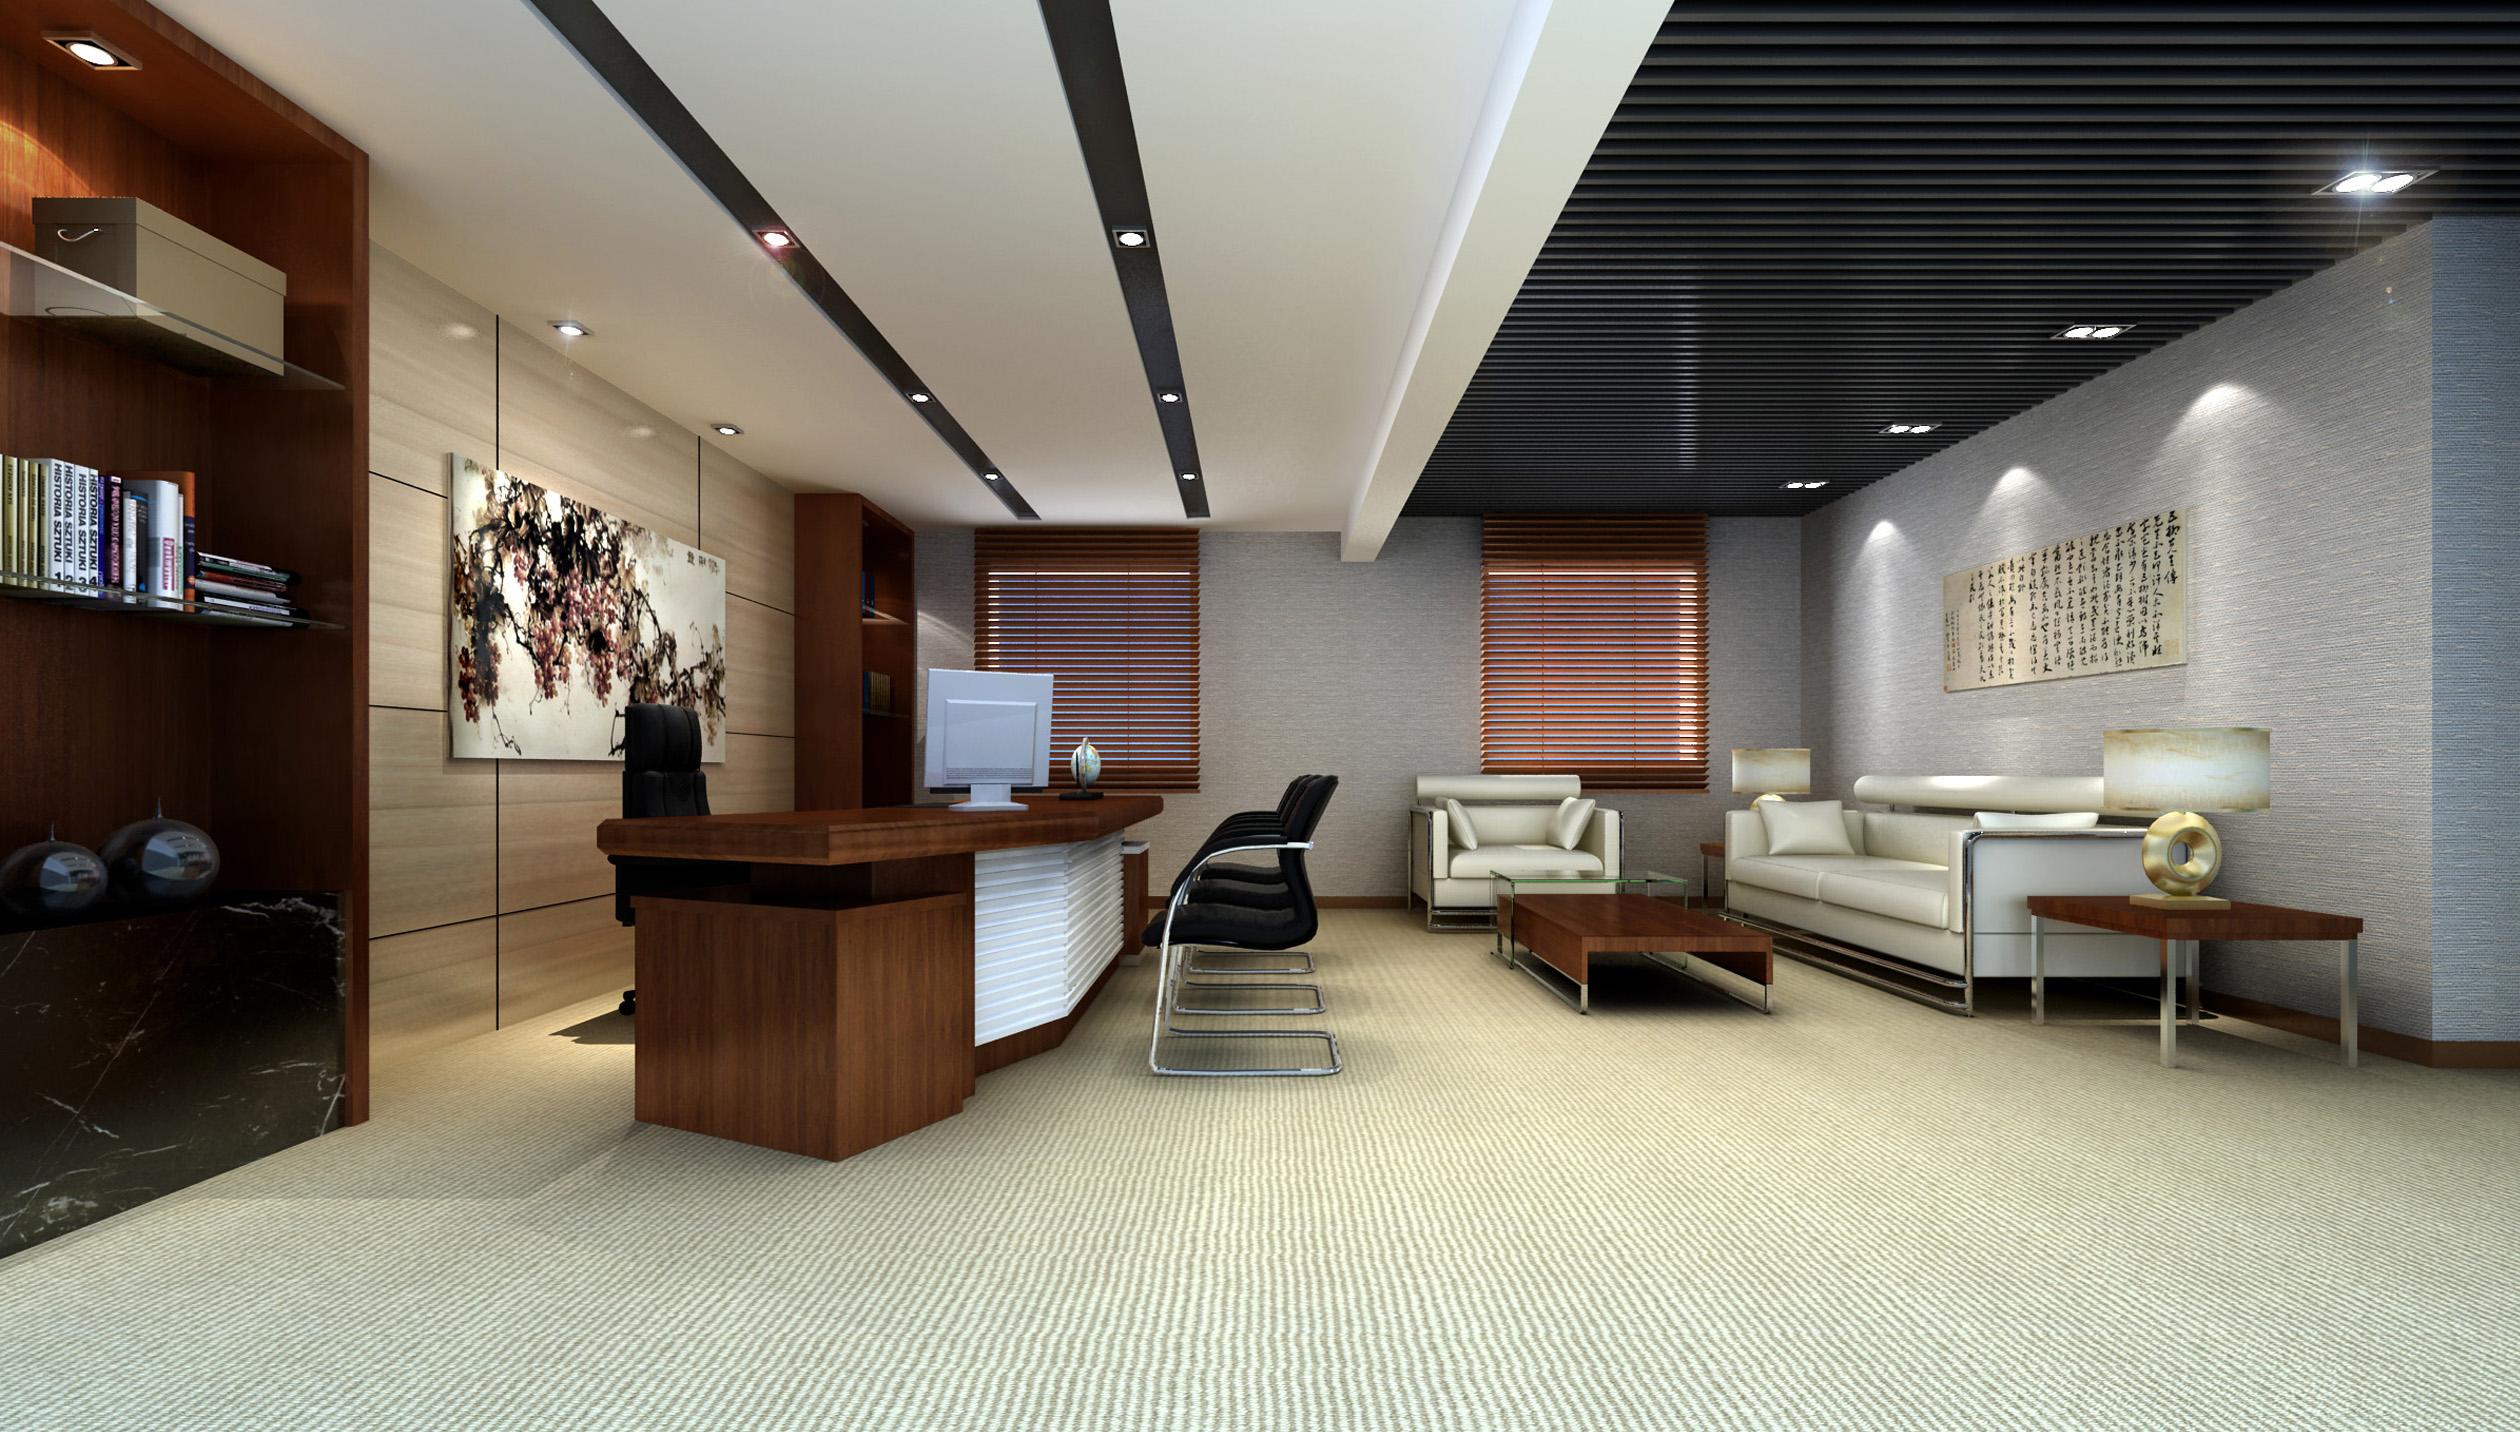 office 045 3d model max 137281